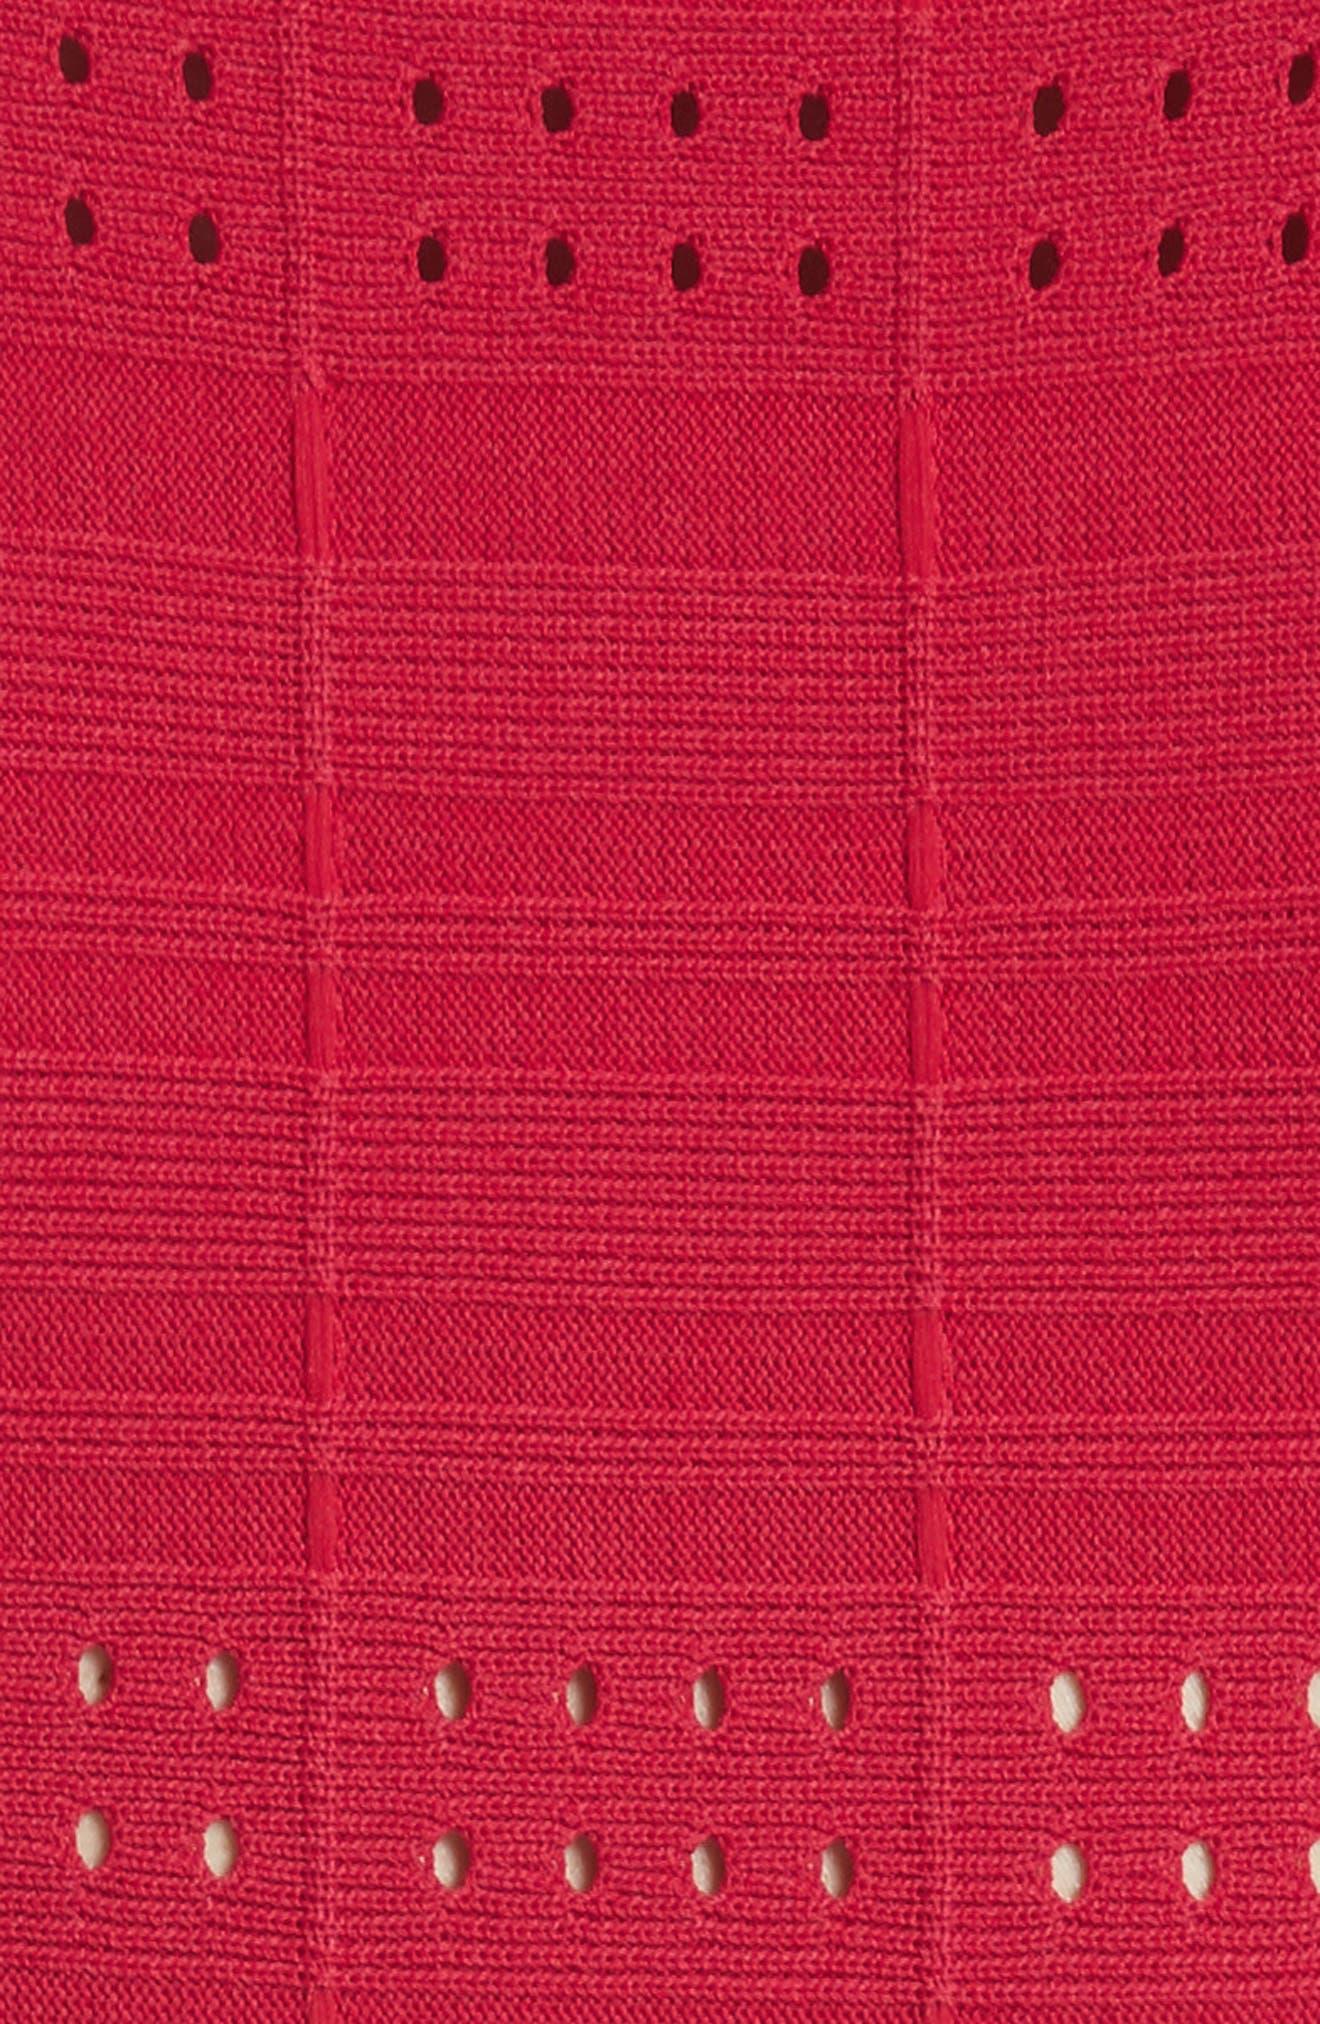 Scallop Trim Knit Dress,                             Alternate thumbnail 6, color,